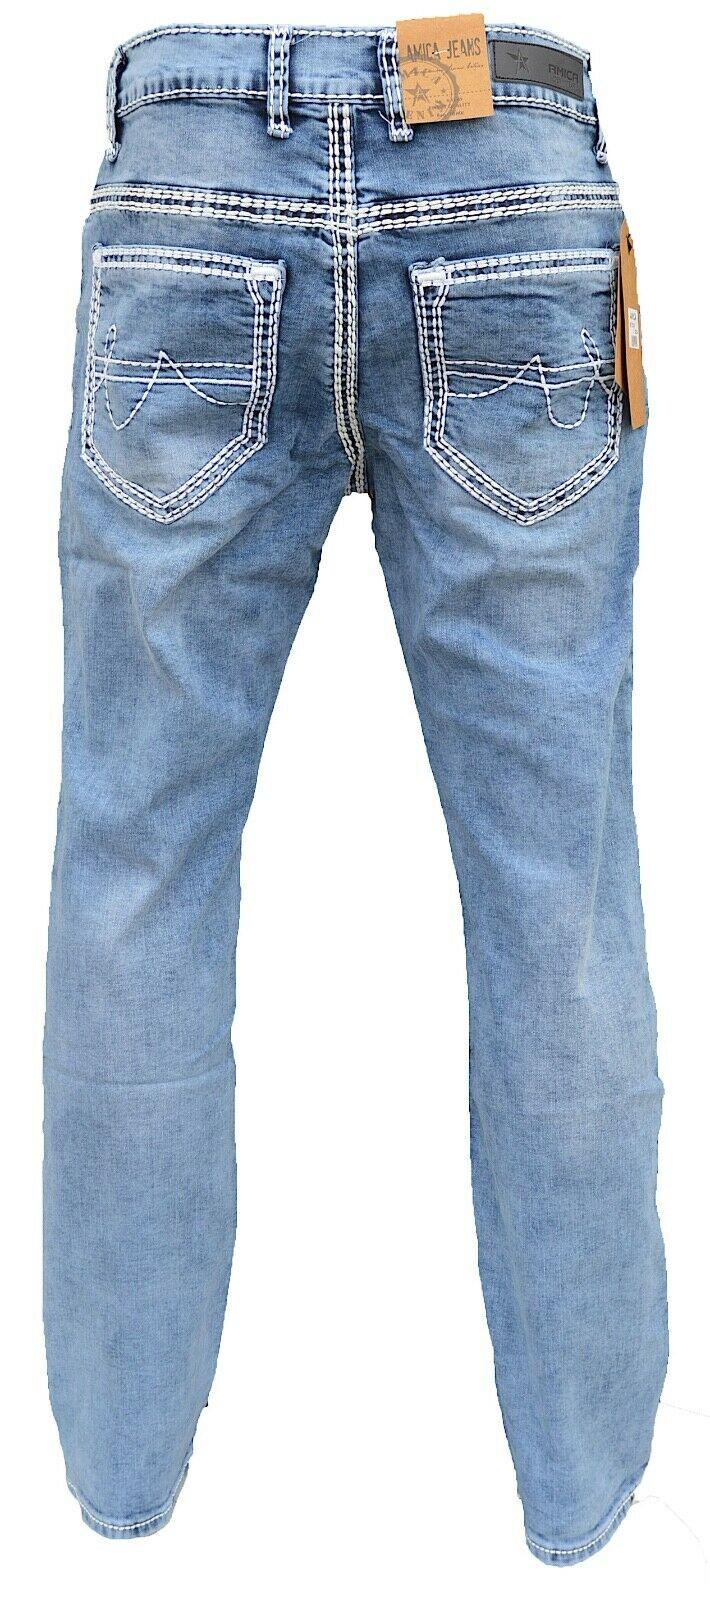 Herren-Jeans-Hose-Denim-KC-Black-Washed-Straight-Cut-Regular-Dicke-Naht-naehte Indexbild 26